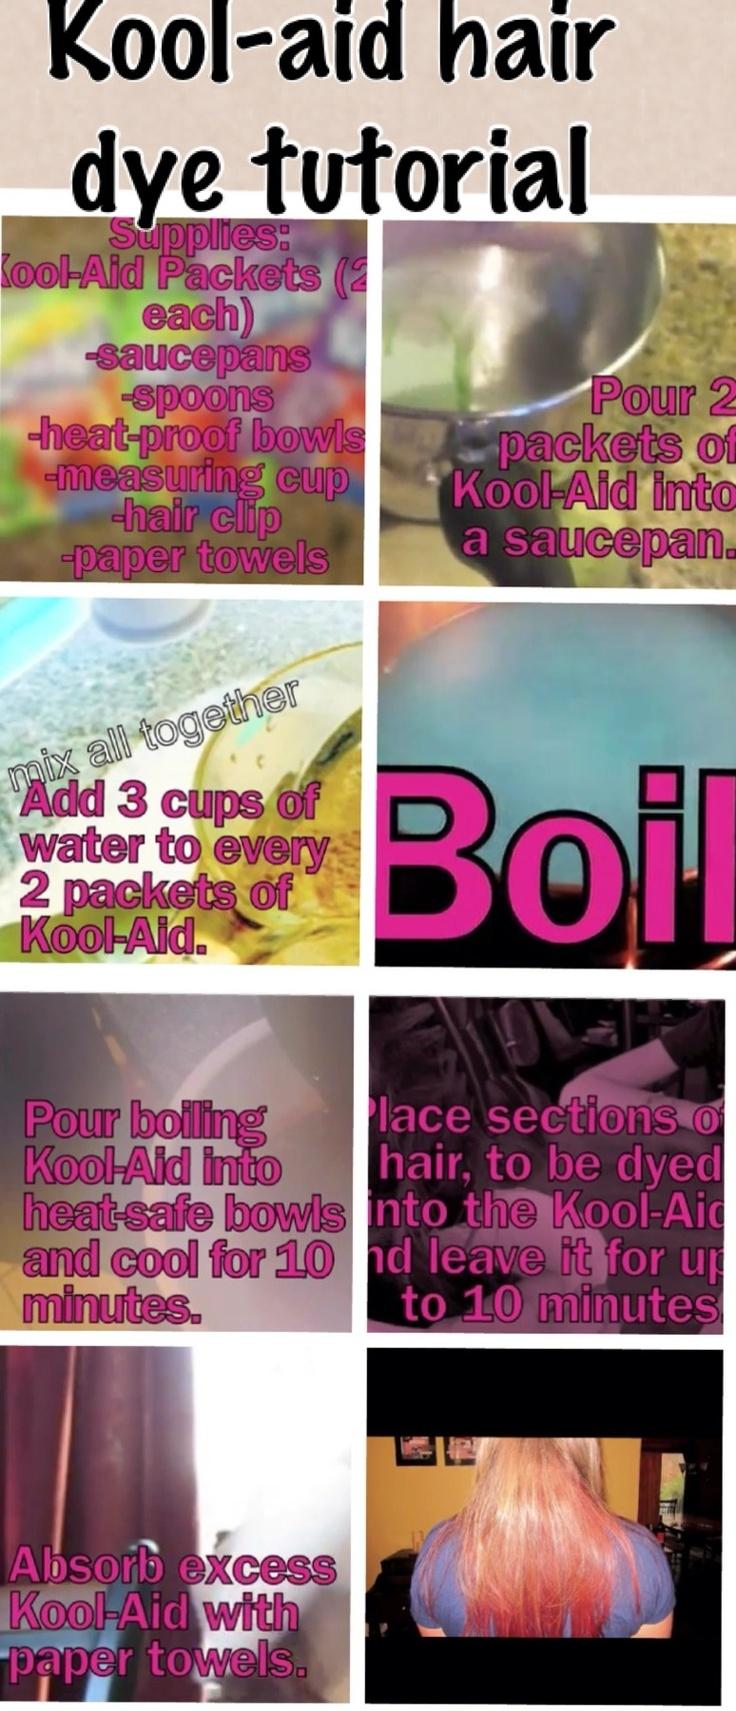 48 best Kool-aid hair images on Pinterest | Hairstyles, Hair ideas ...